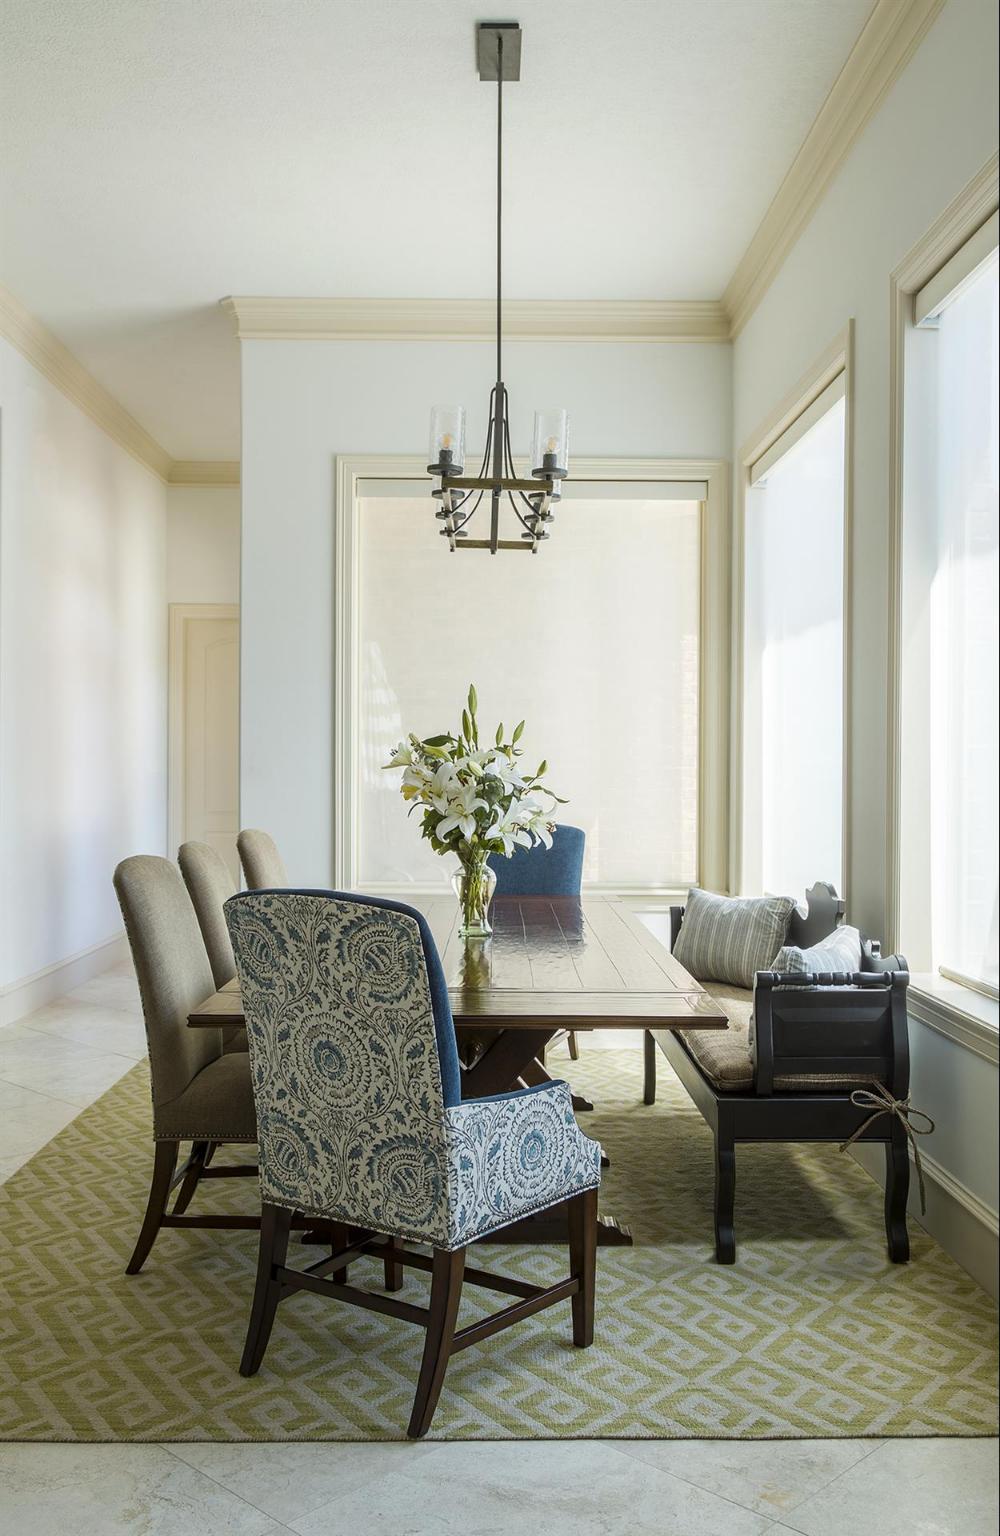 By Design Interiors Inc Houston Interior Design Firm By Design Interiors Interior Design Diy Interior Decor Interior Design Interior Design Living Room